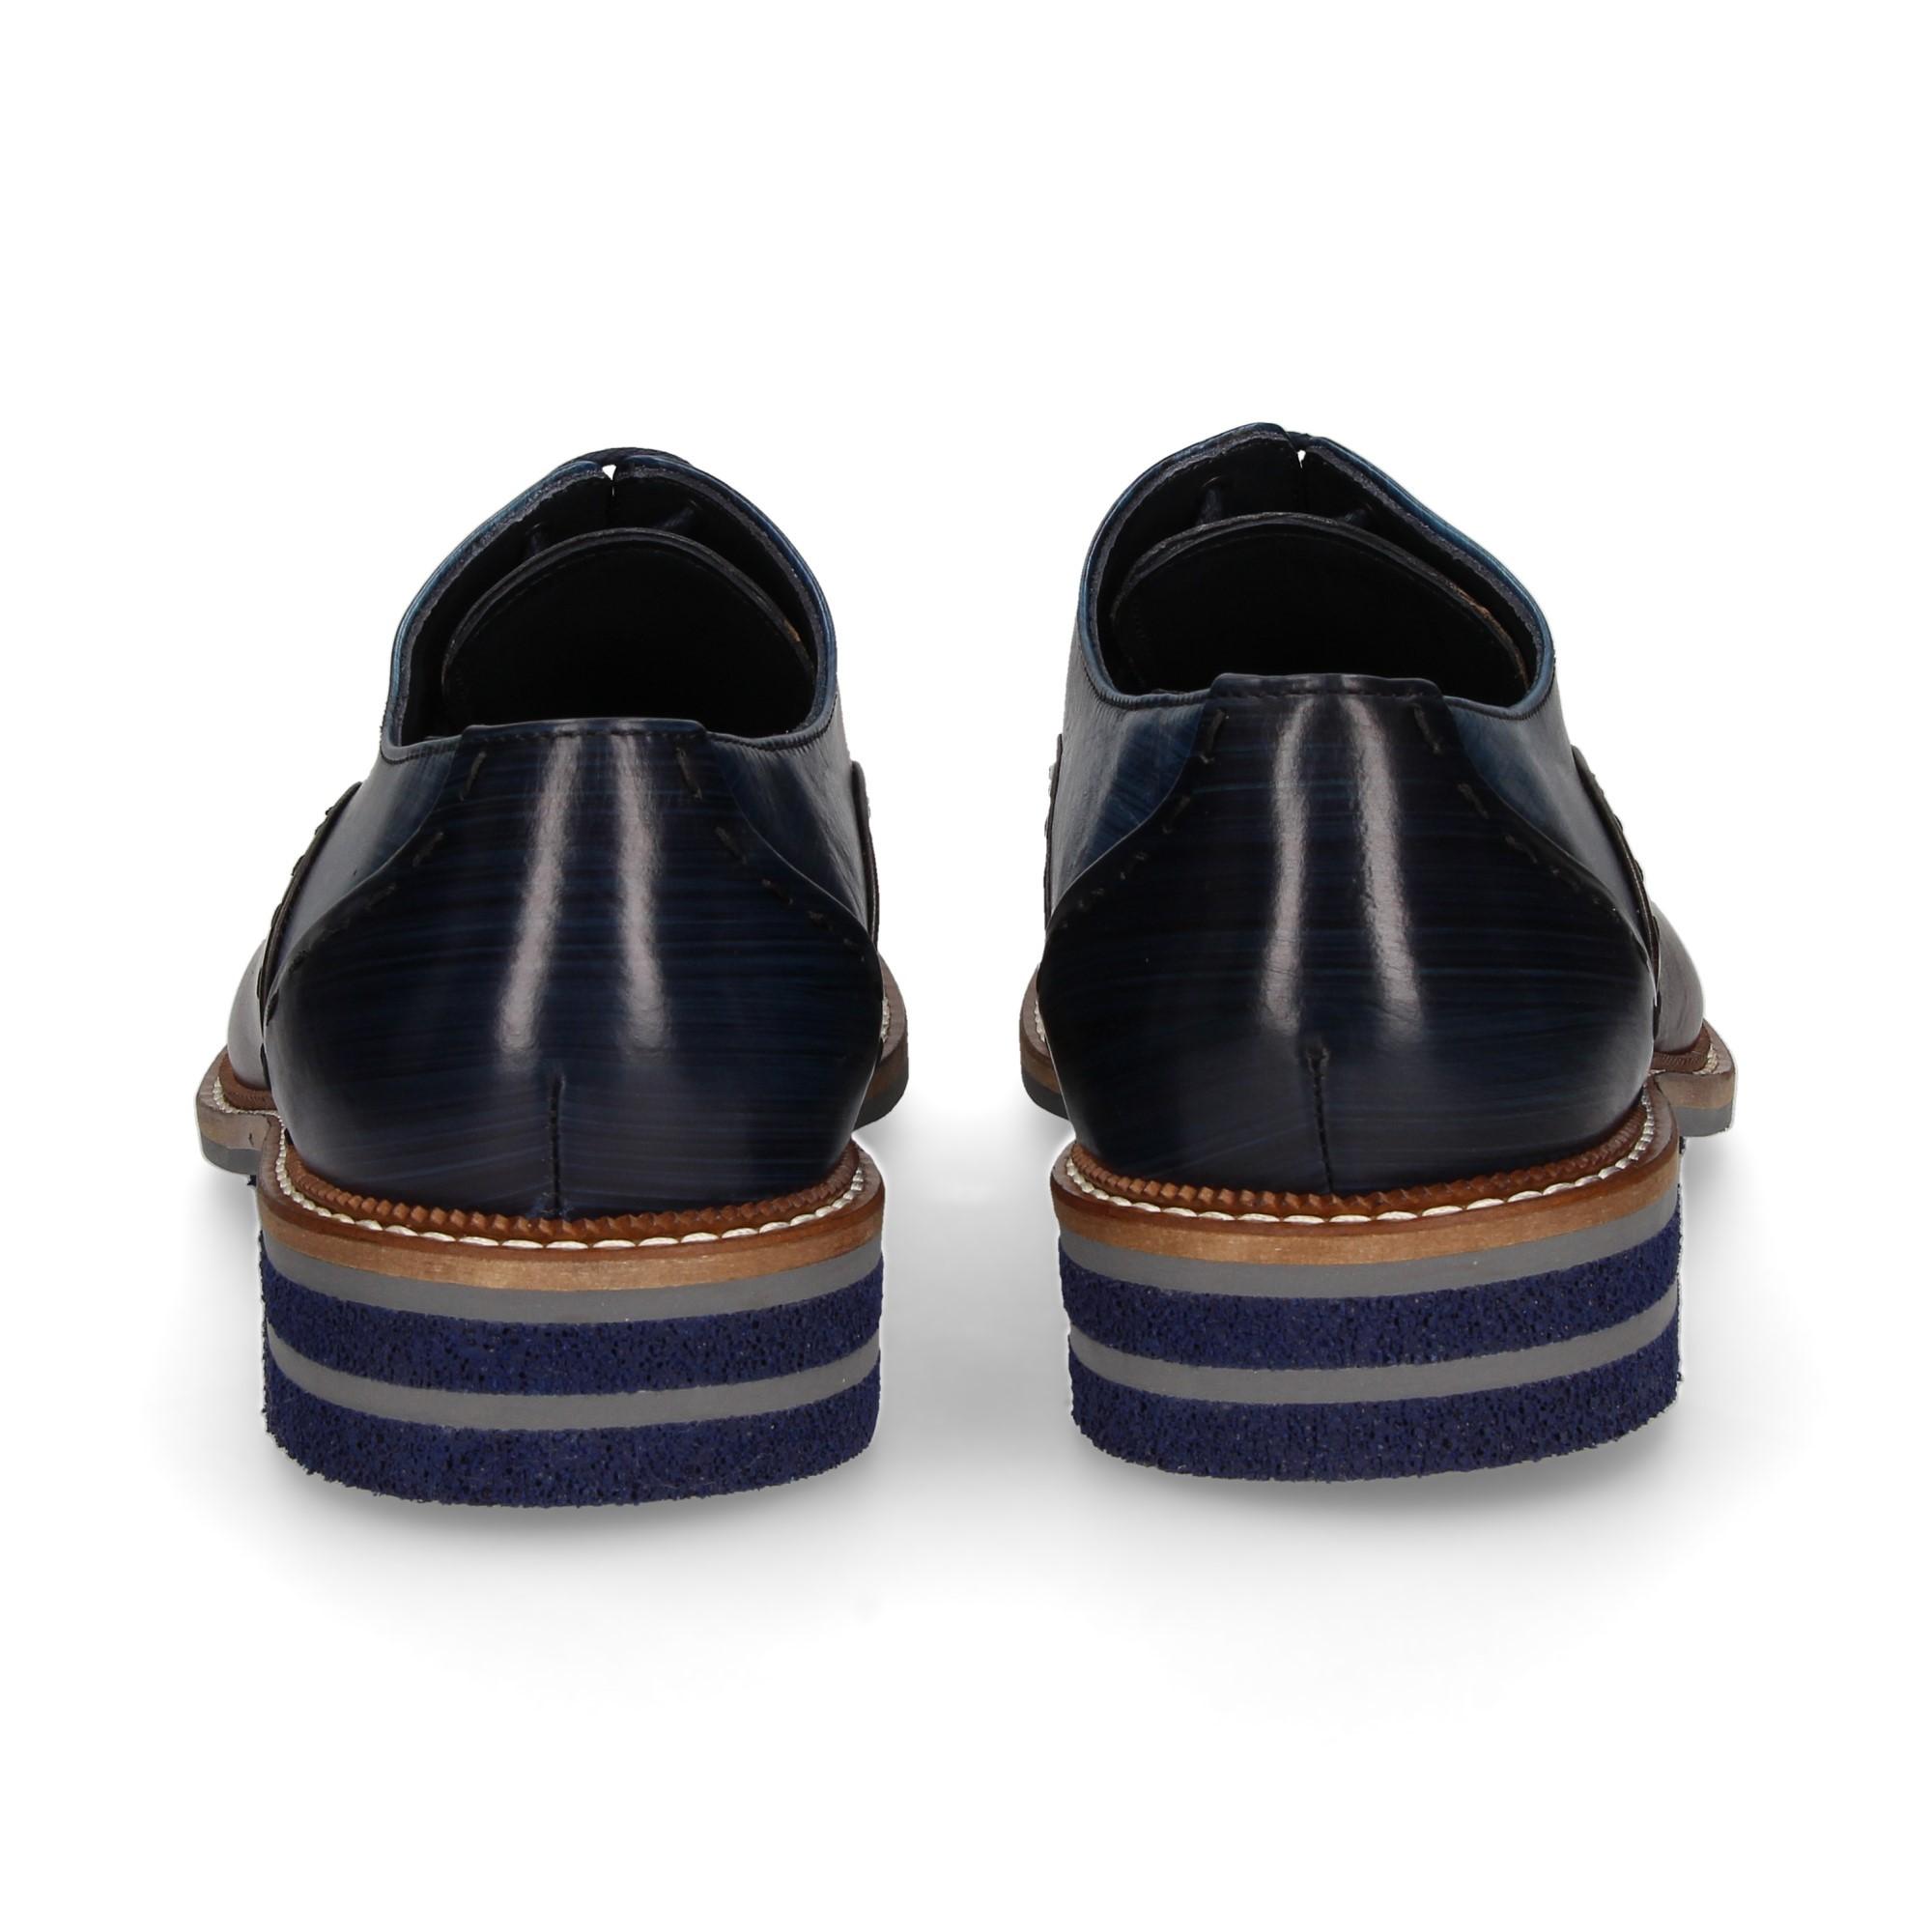 ingles-pcosturas-azul-gris-azulon